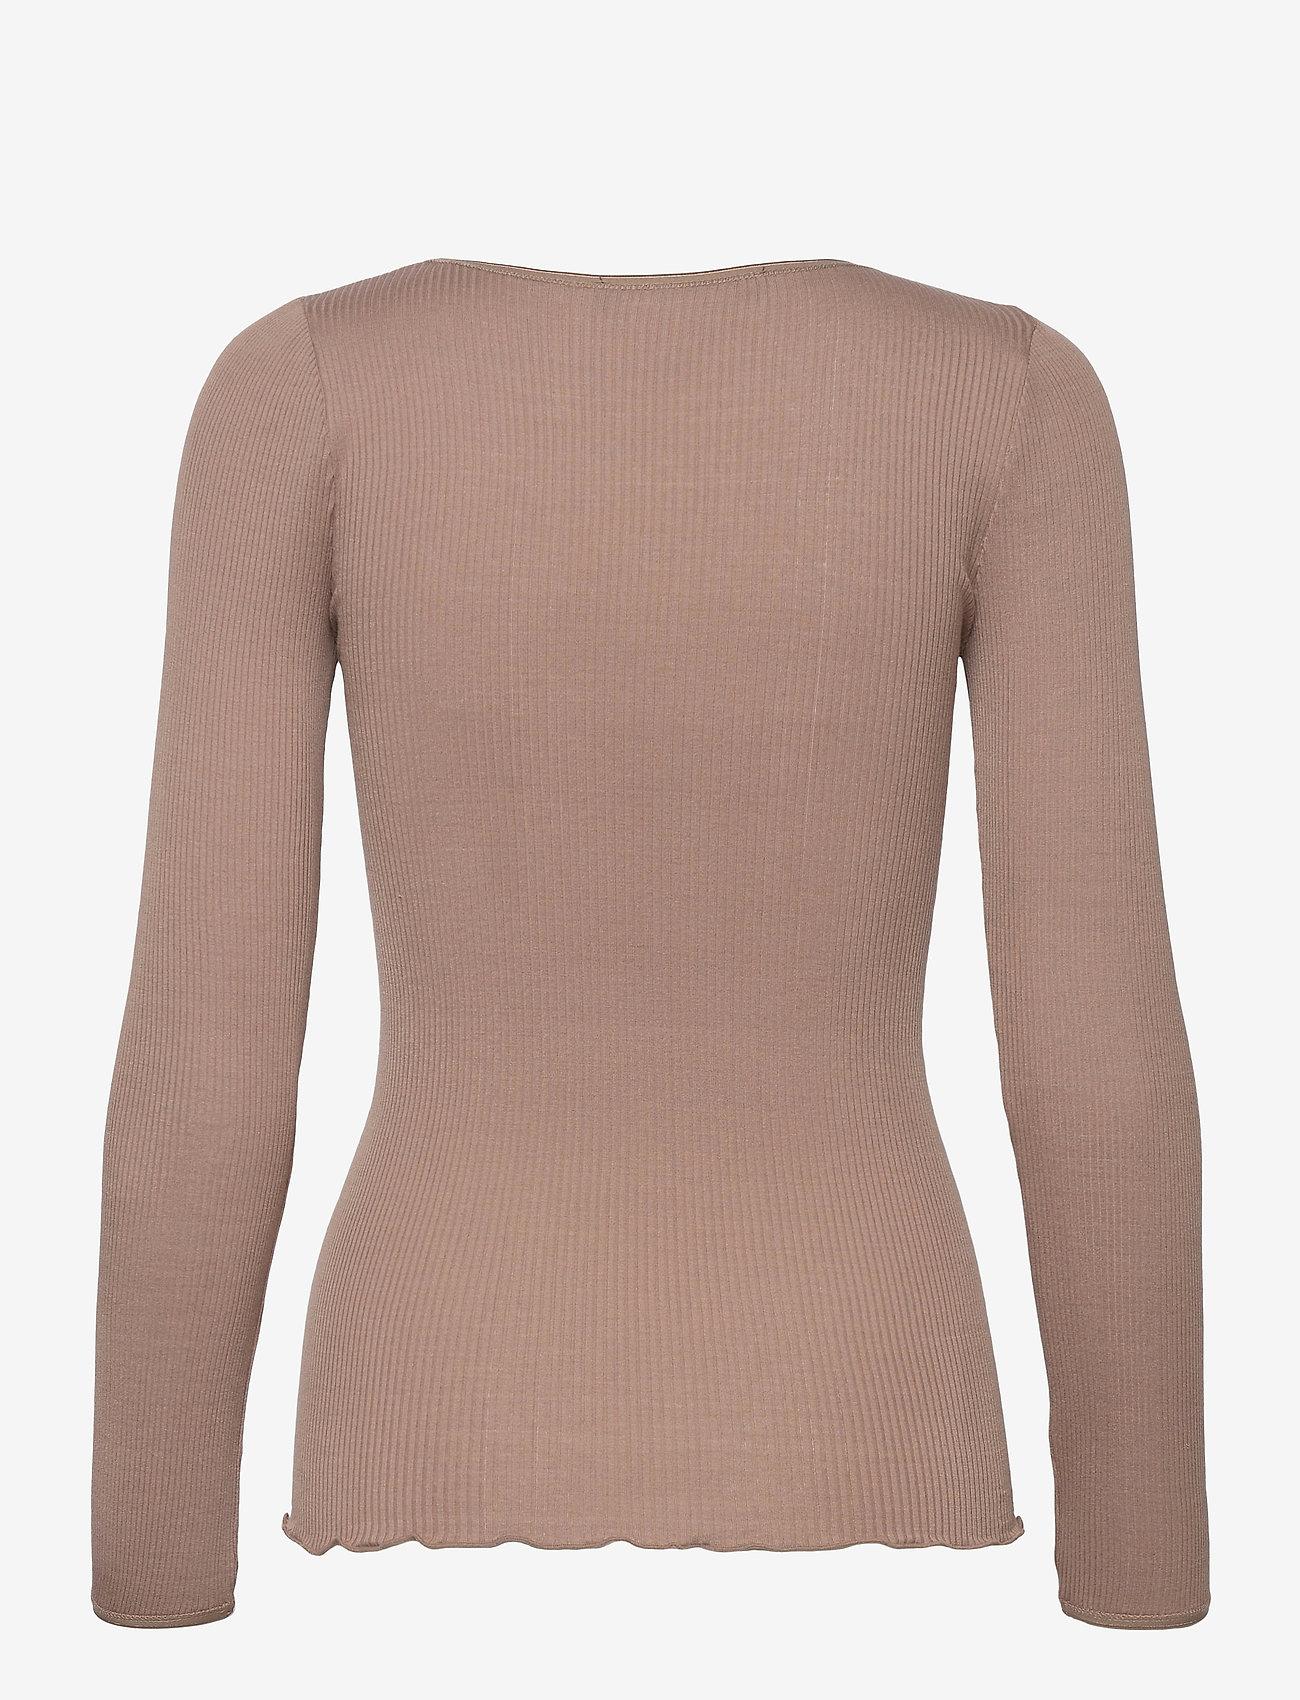 Rosemunde - Silk t-shirt w/ elastic band - långärmade toppar - dark sand - 1